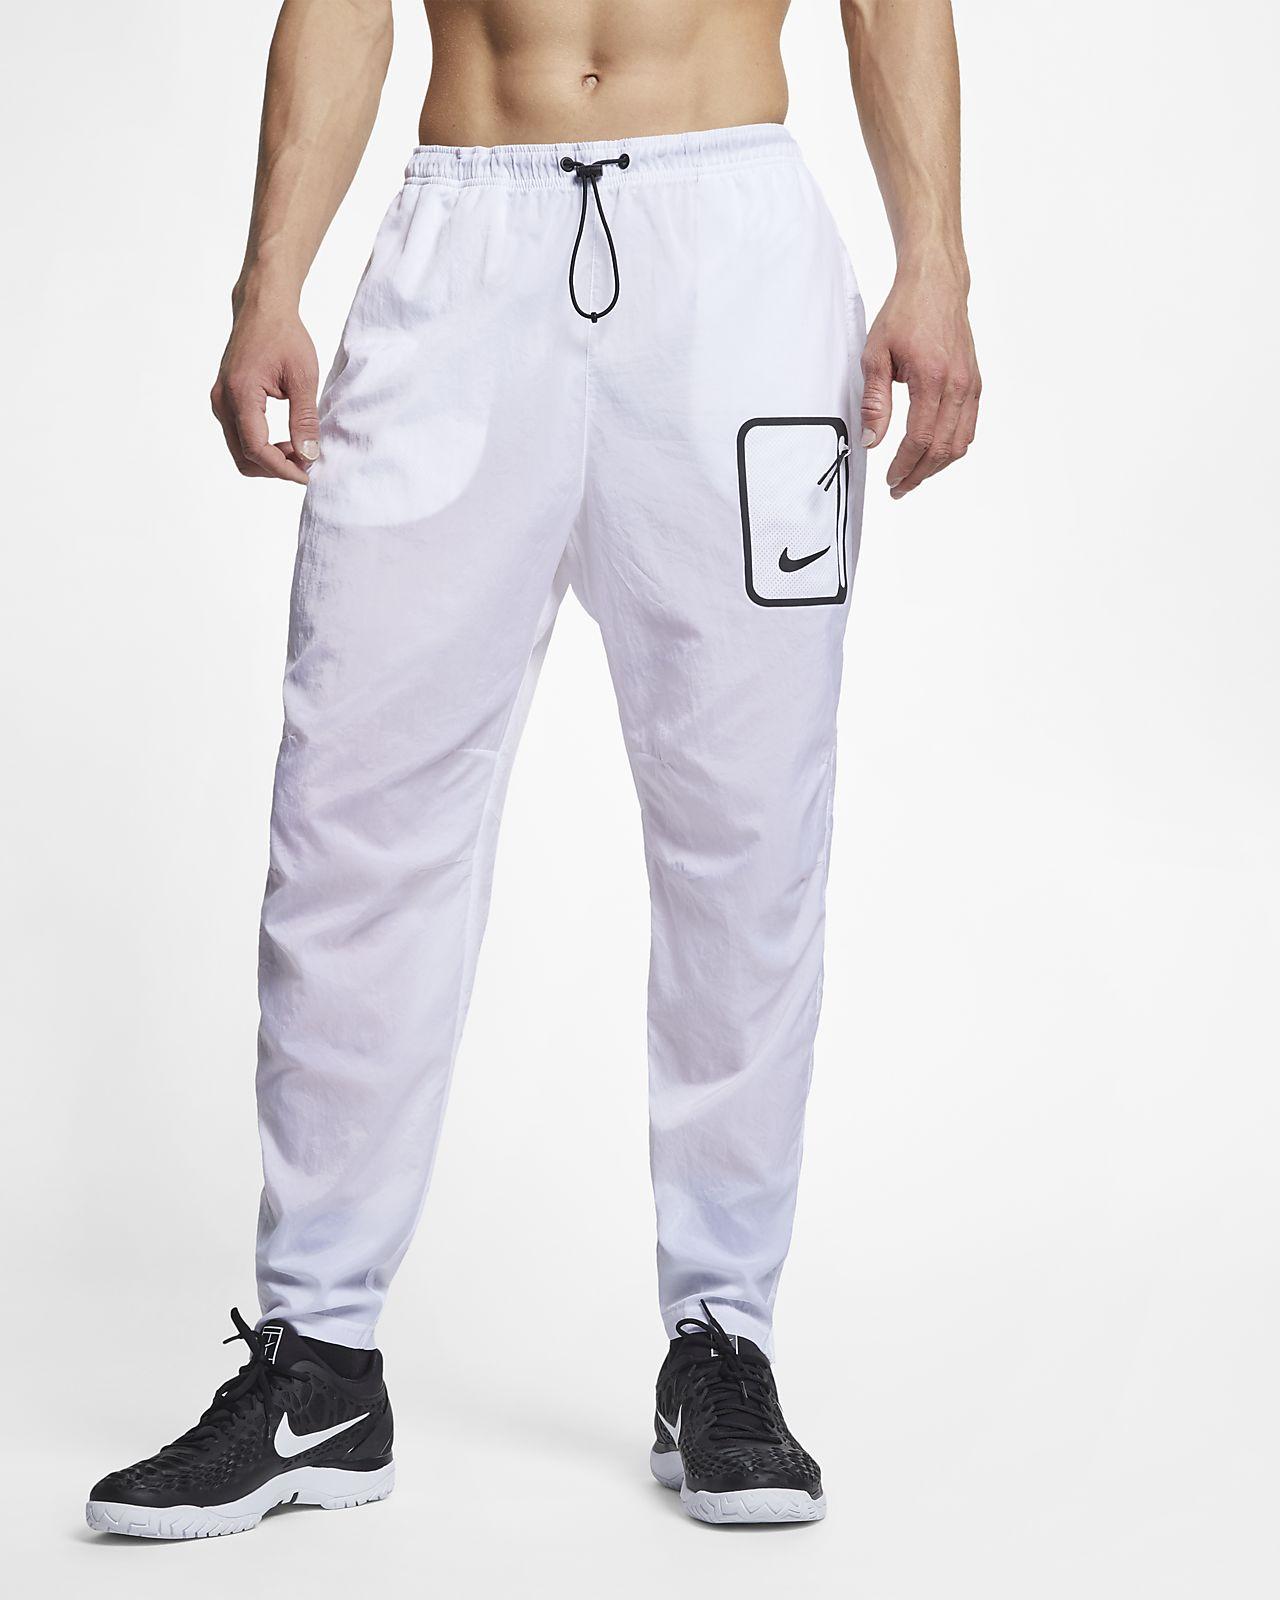 NikeCourt Pantalons de tennis - Home